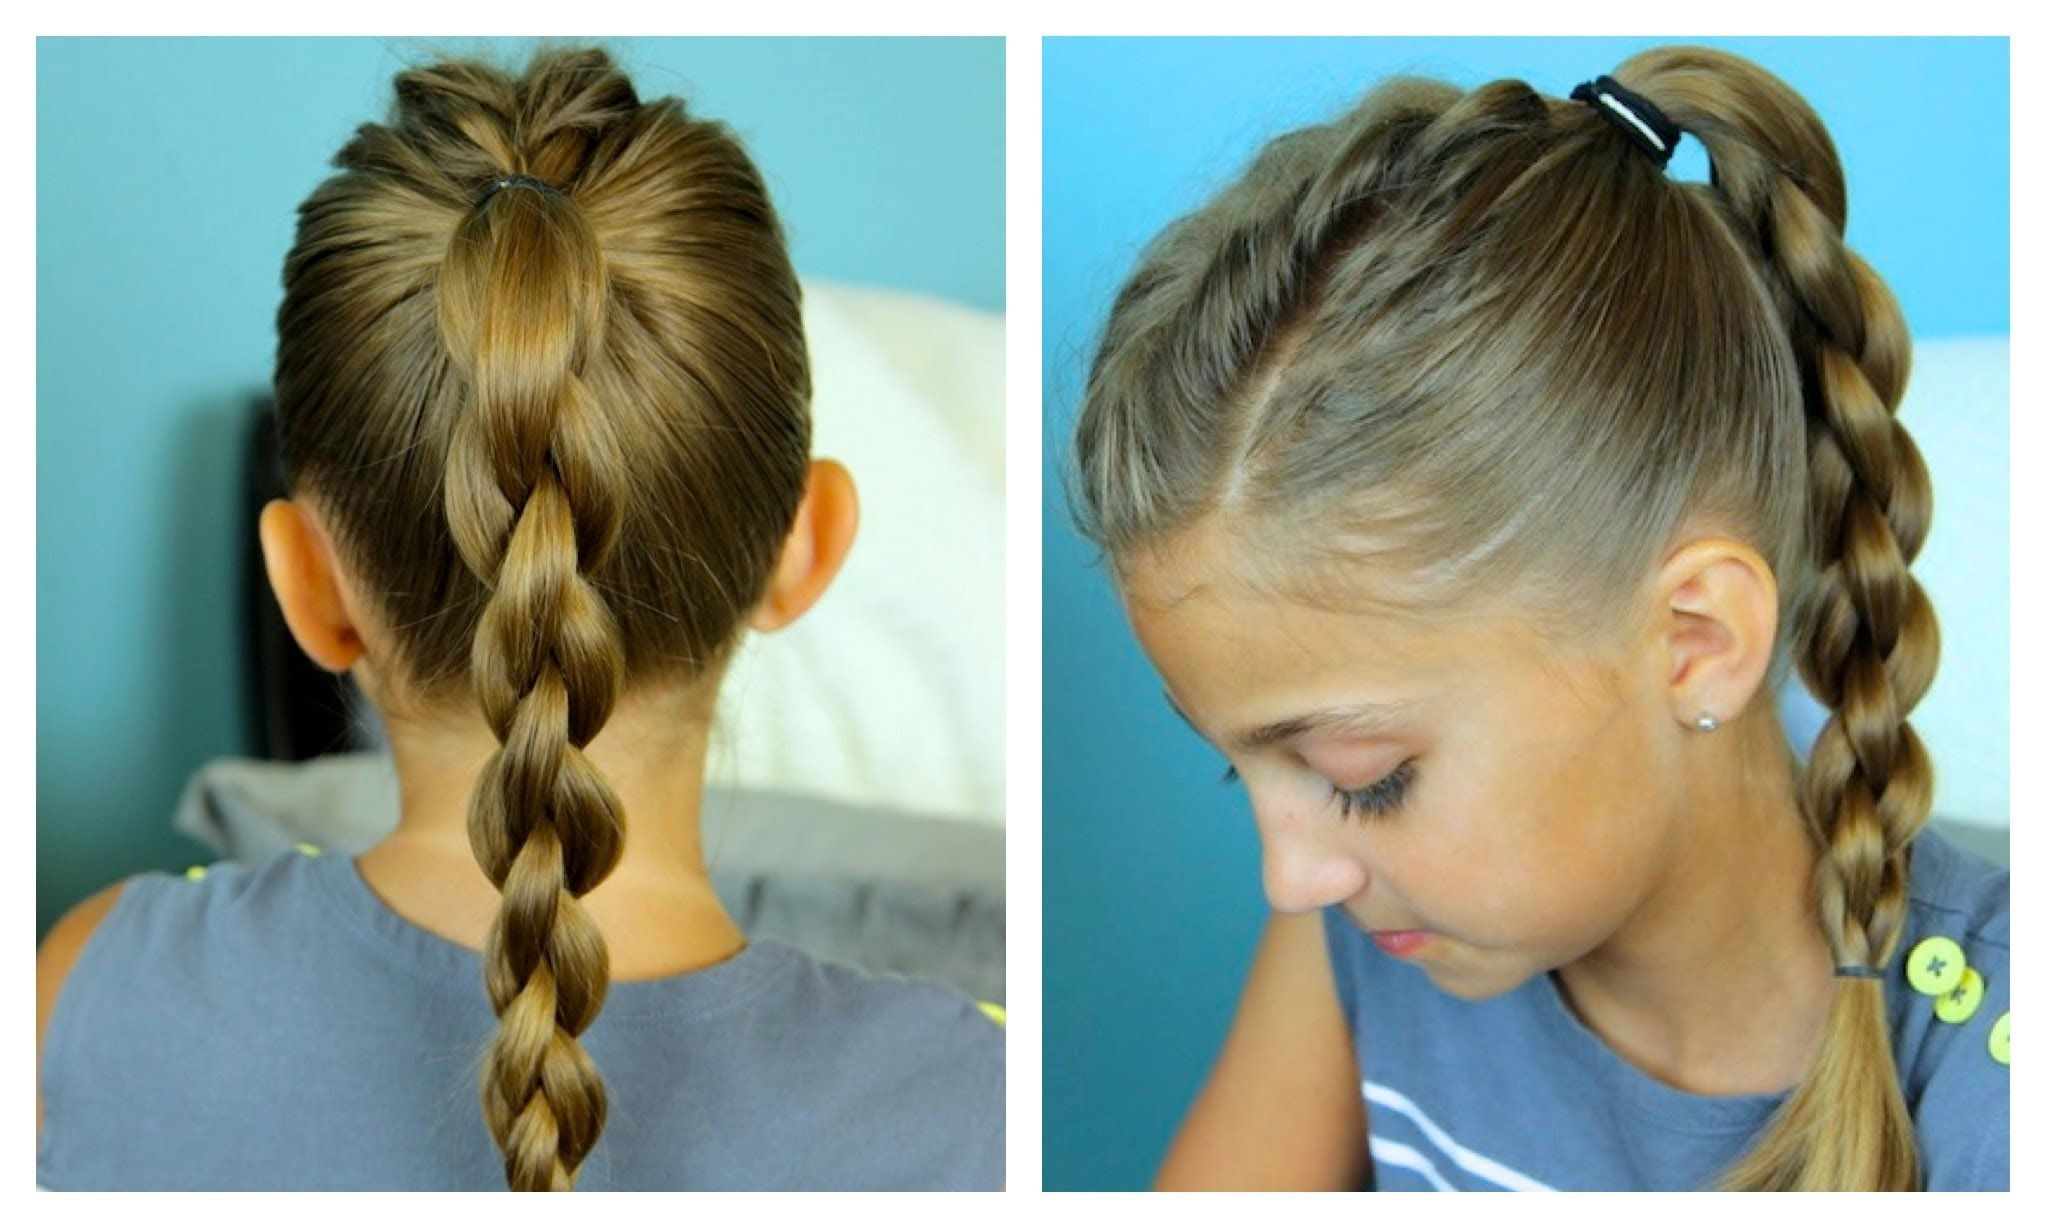 hairstyles - do it yourself | hairstyles – do it yourself